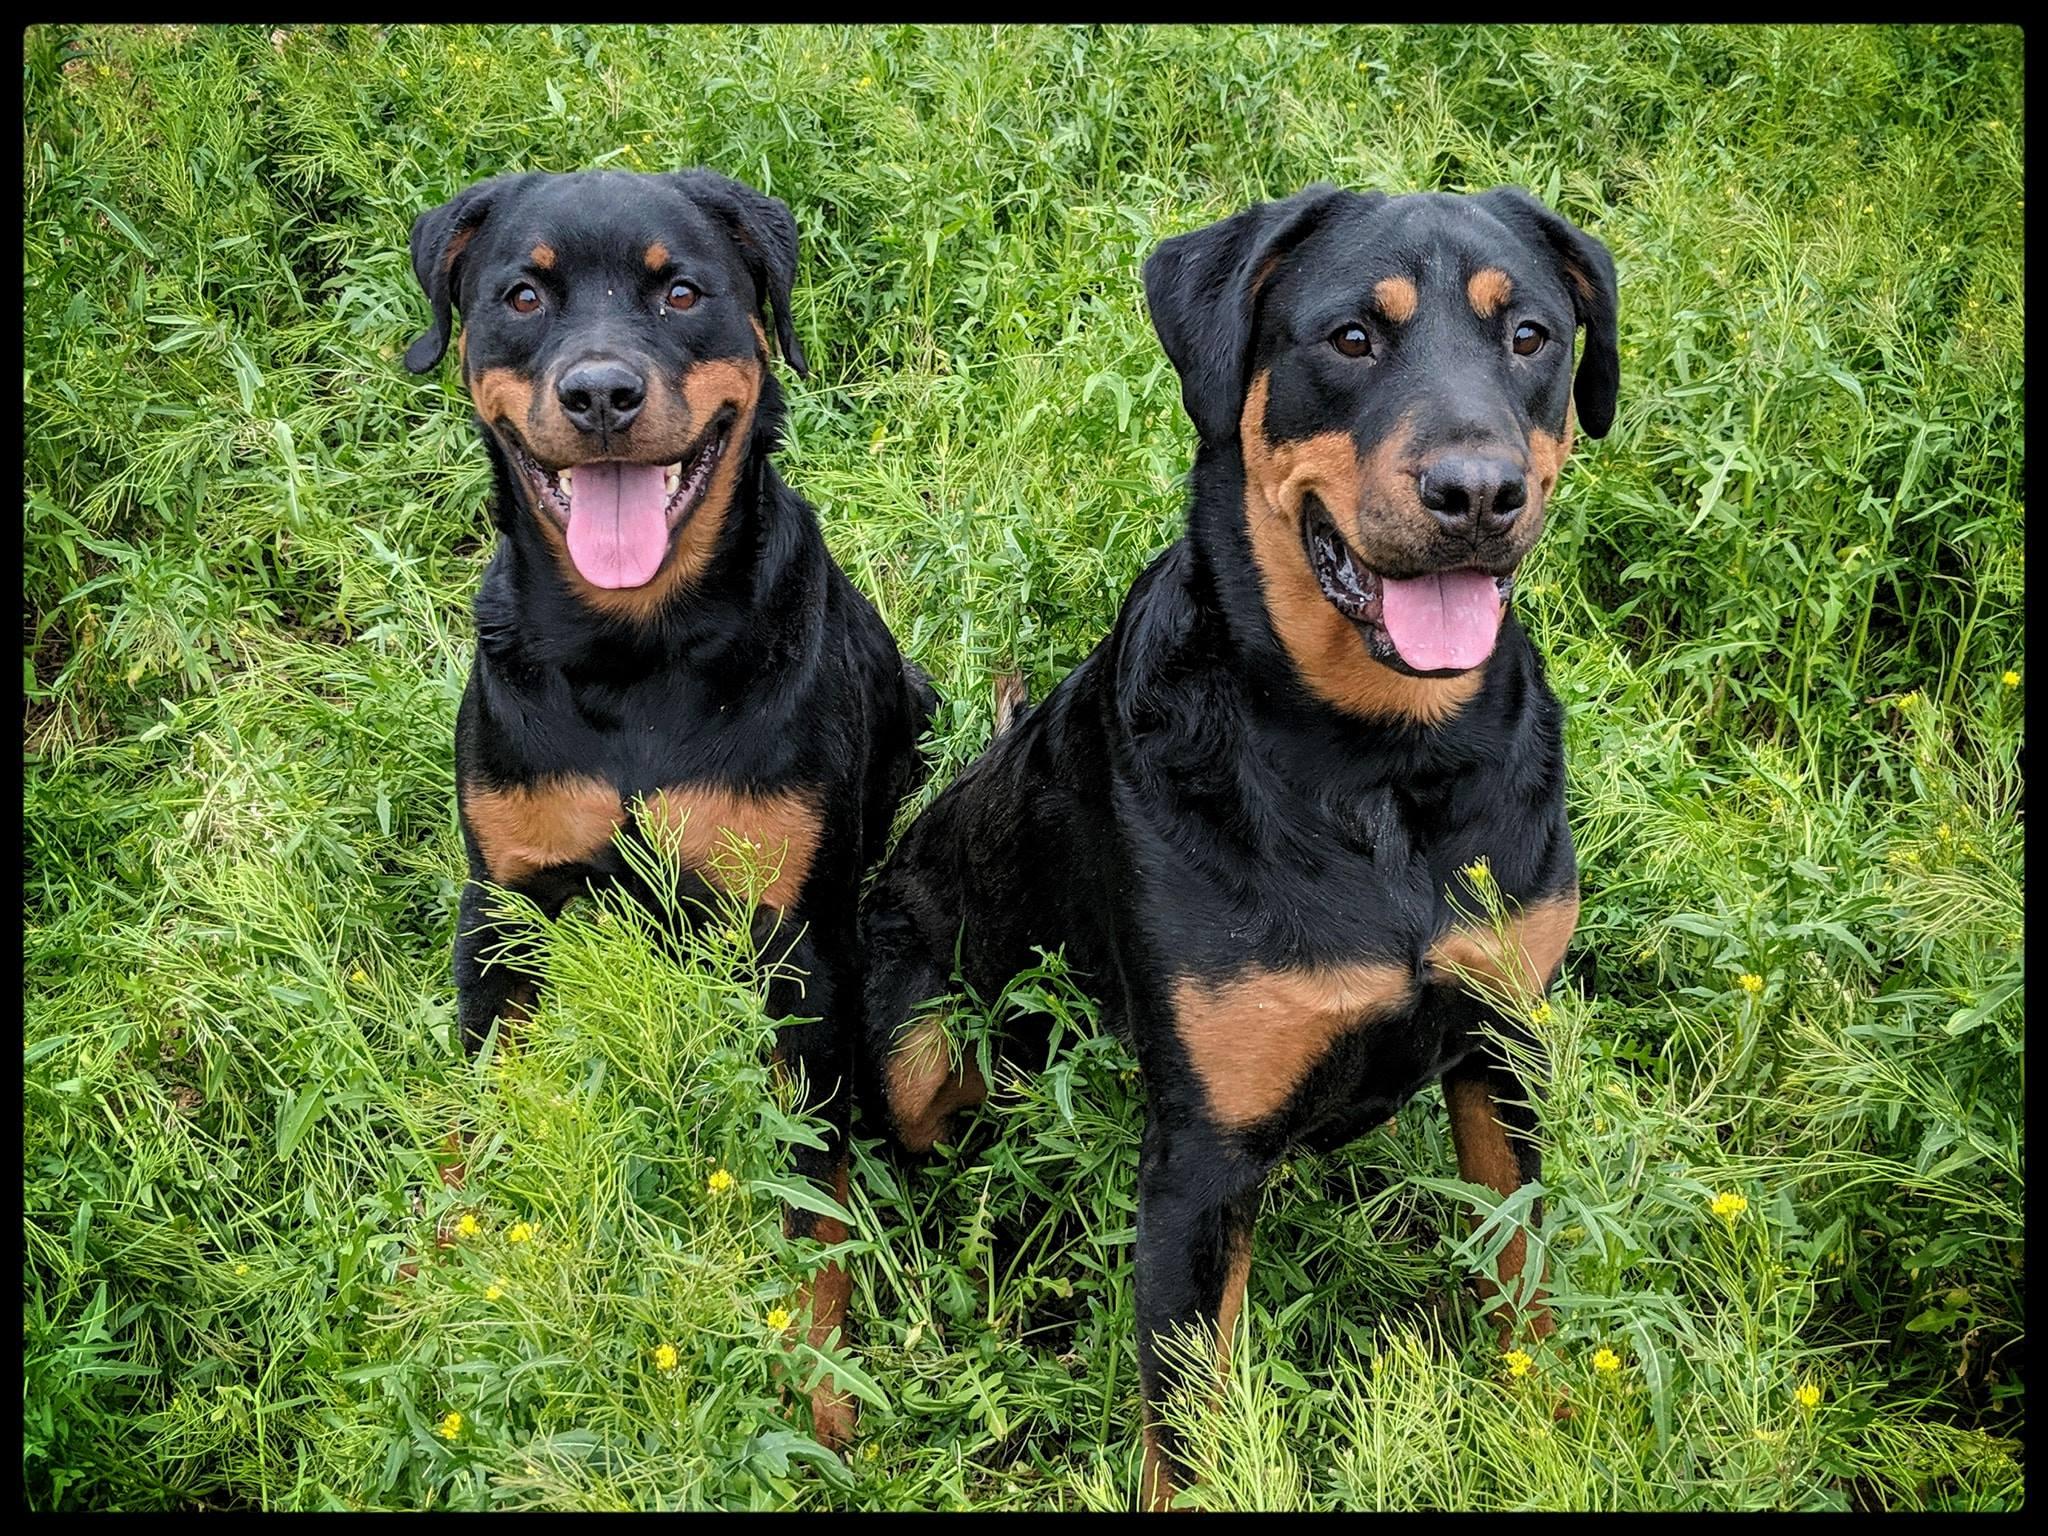 Baldur, Rottweiler on the left, Freya Rottweiler on the right, both sitting in green grass